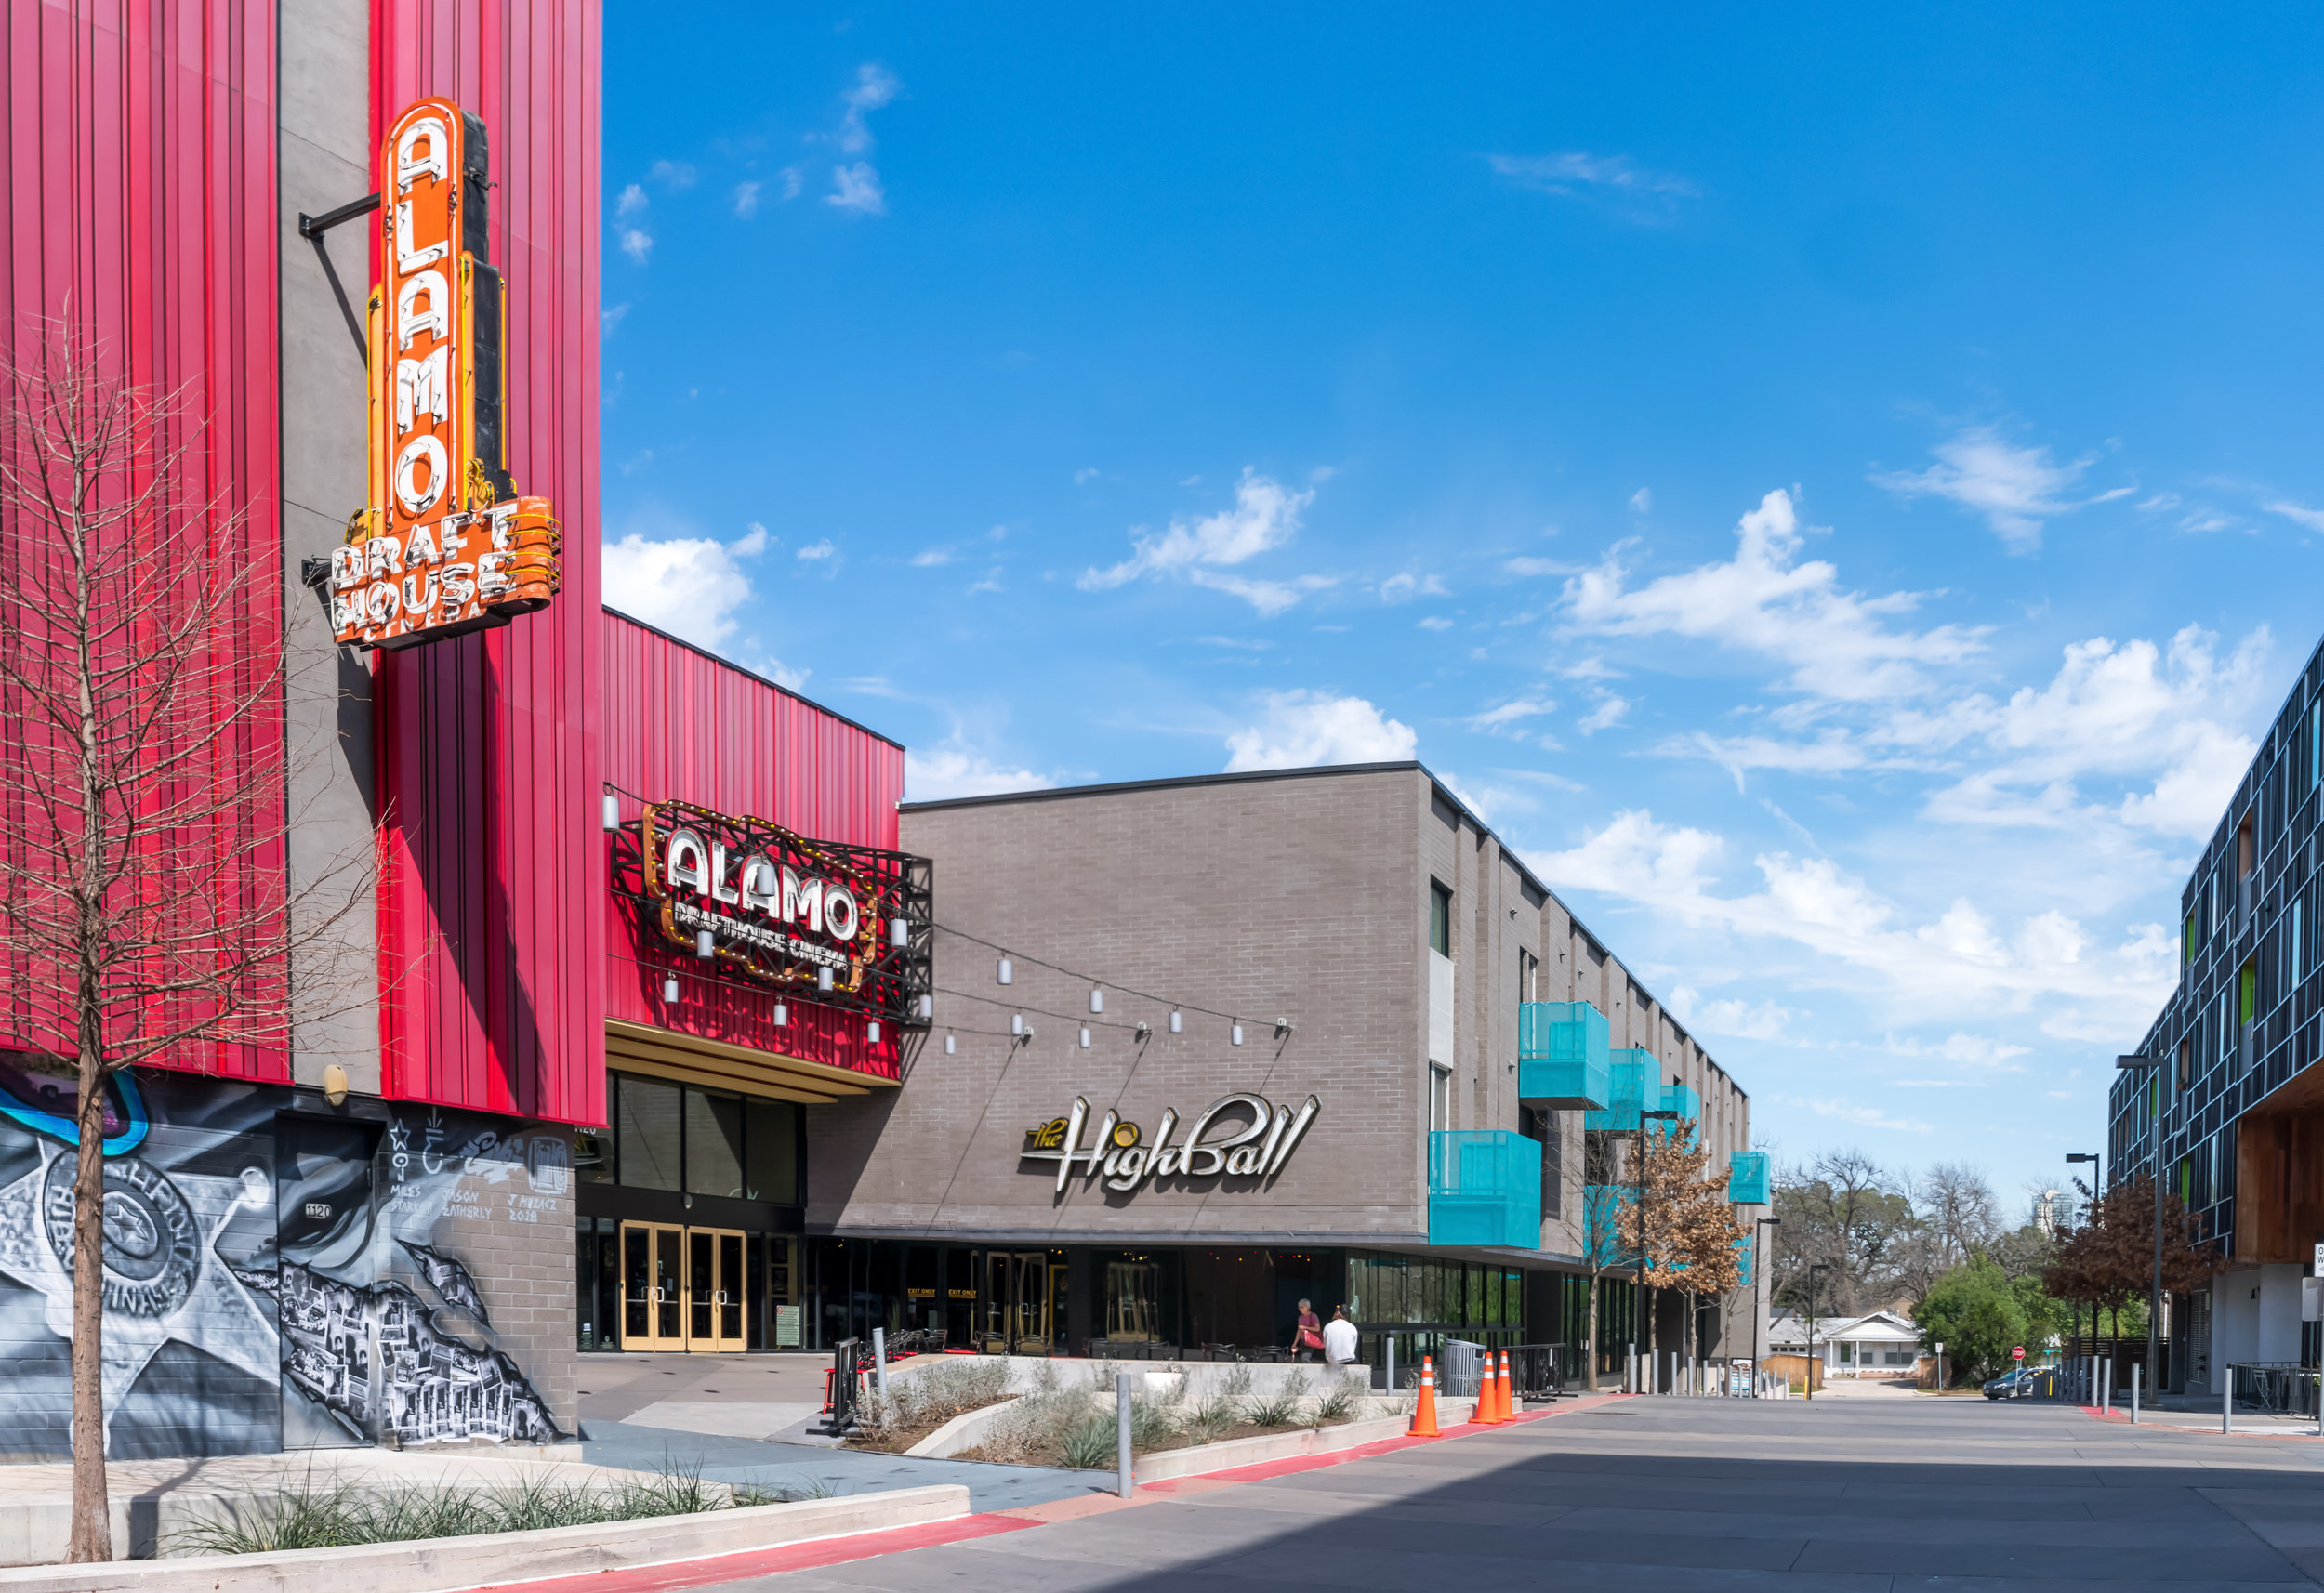 Alamo Village Theater & Retail